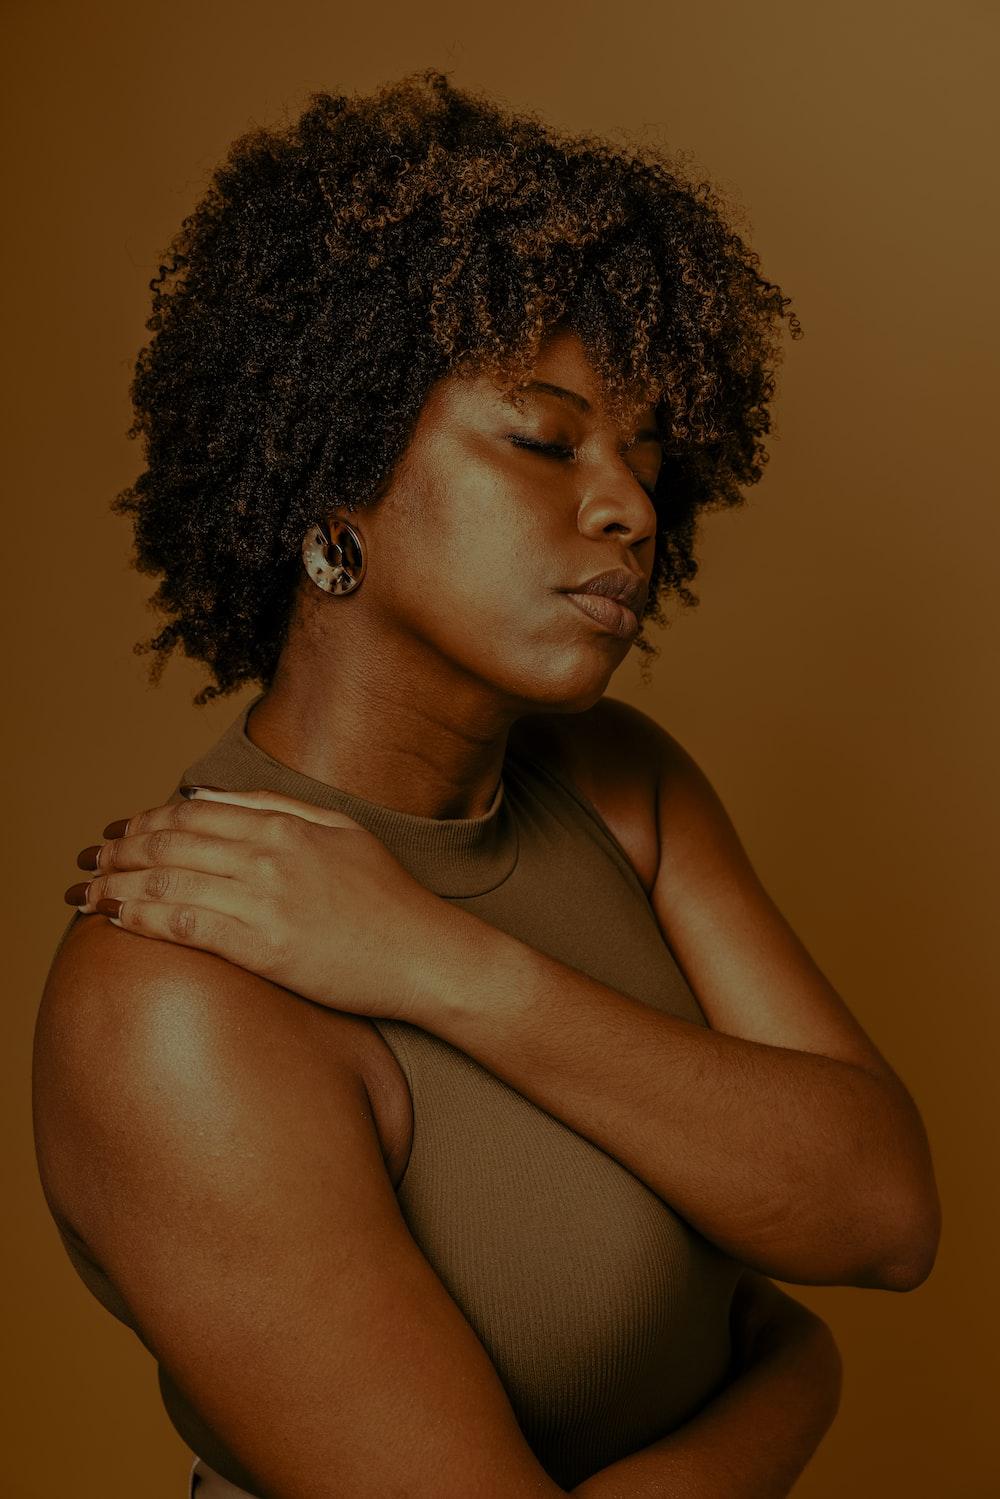 woman in brown tank top